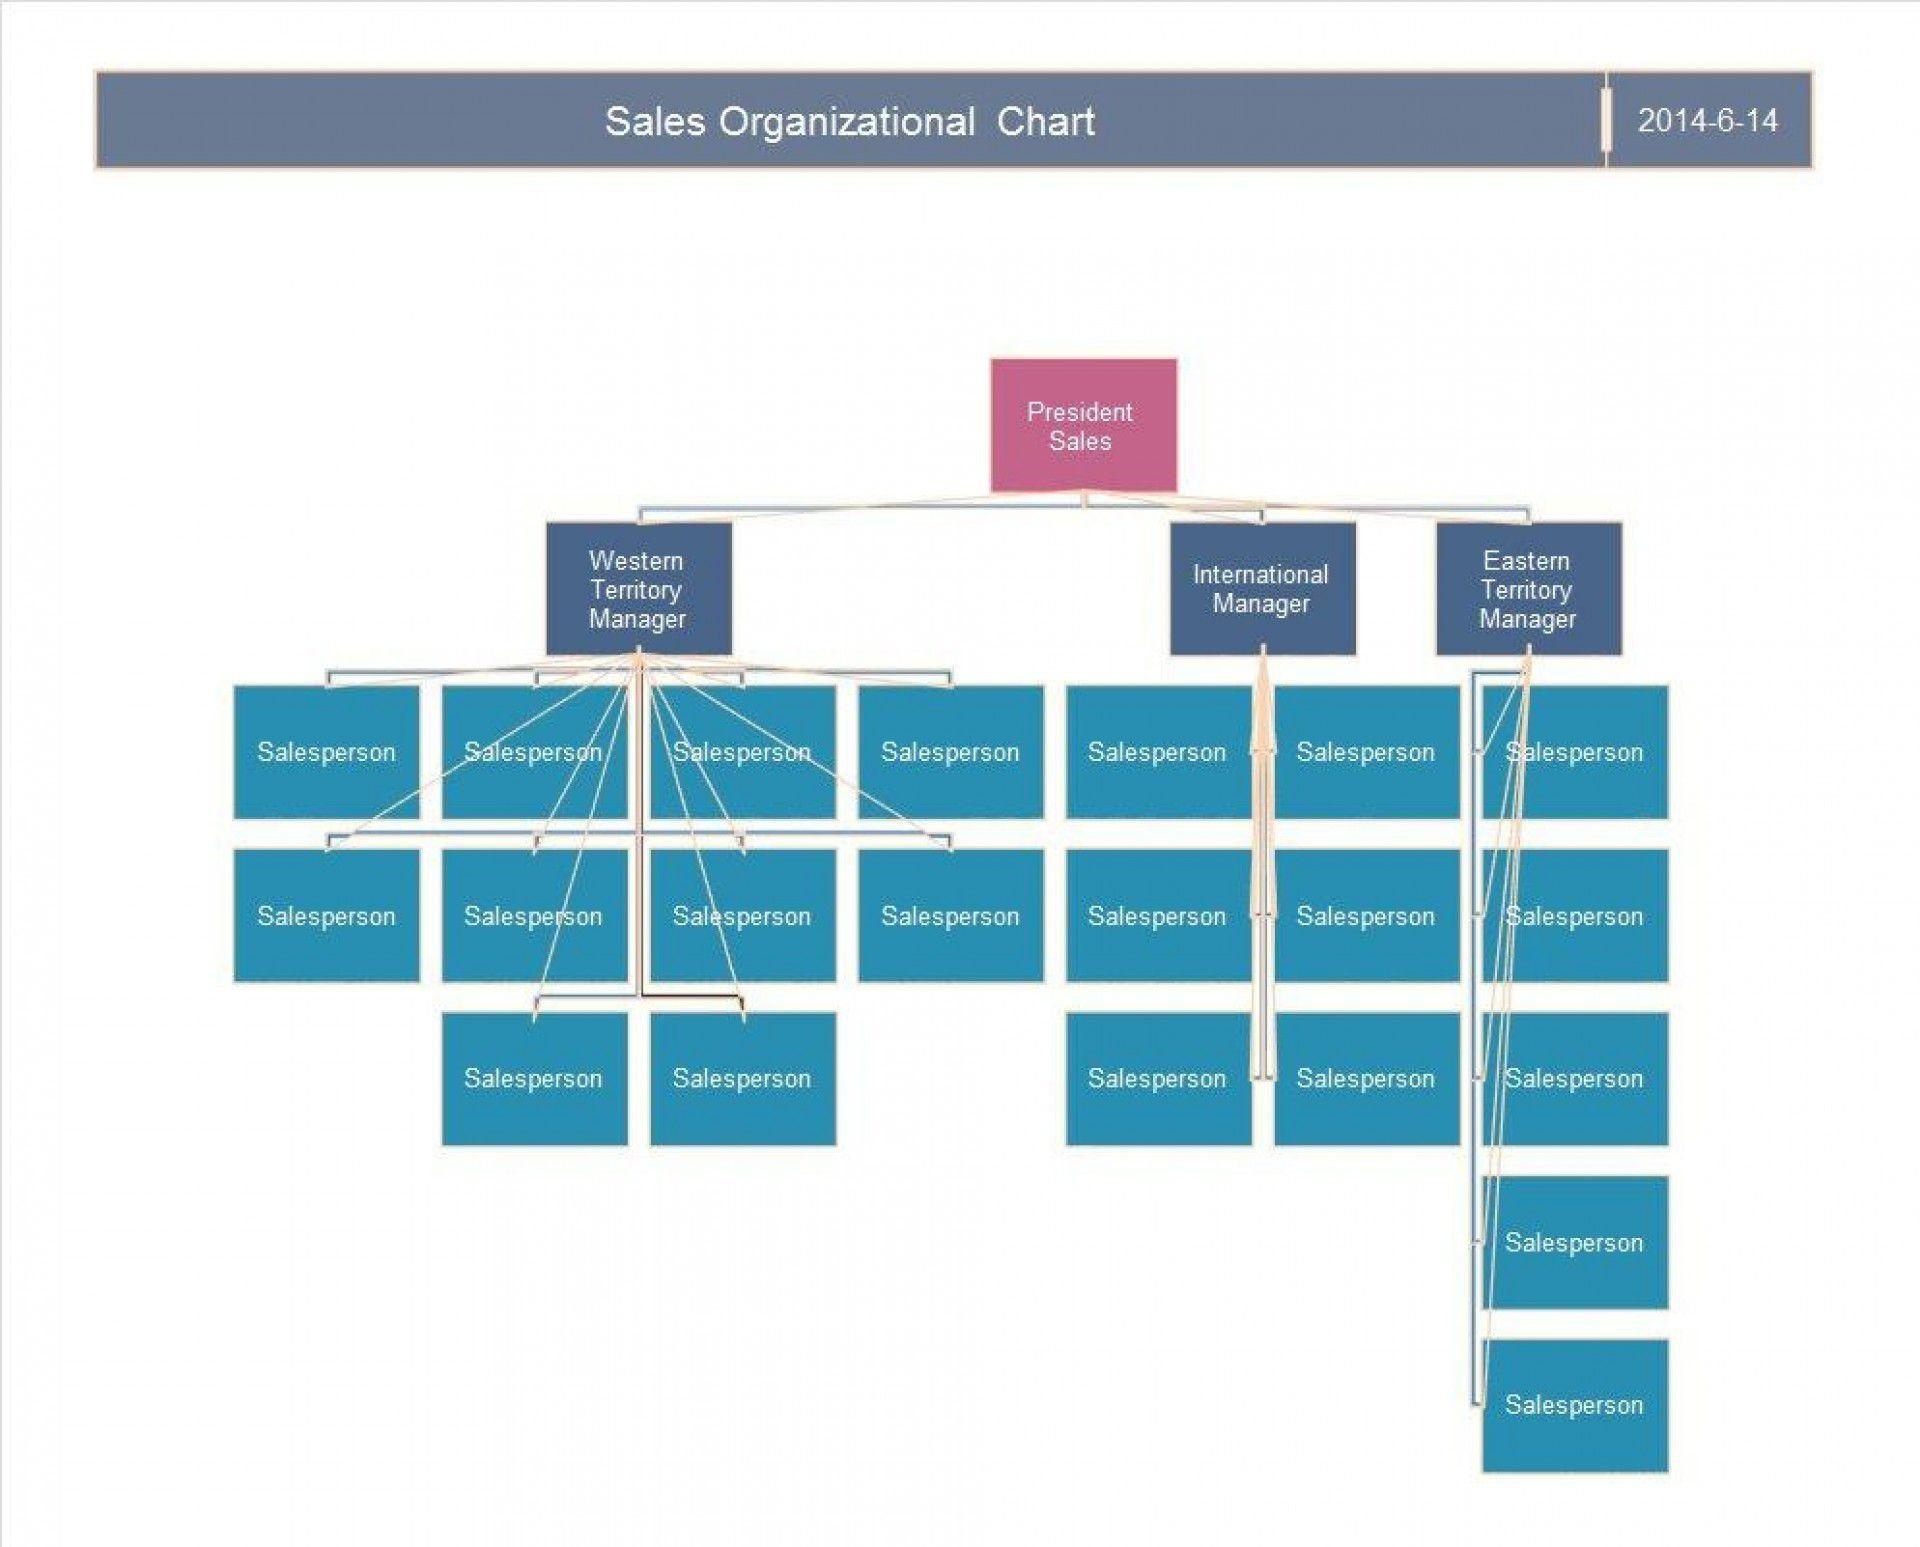 005 Amazing M Office Org Chart Template High Definition  Microsoft Free Organizational1920